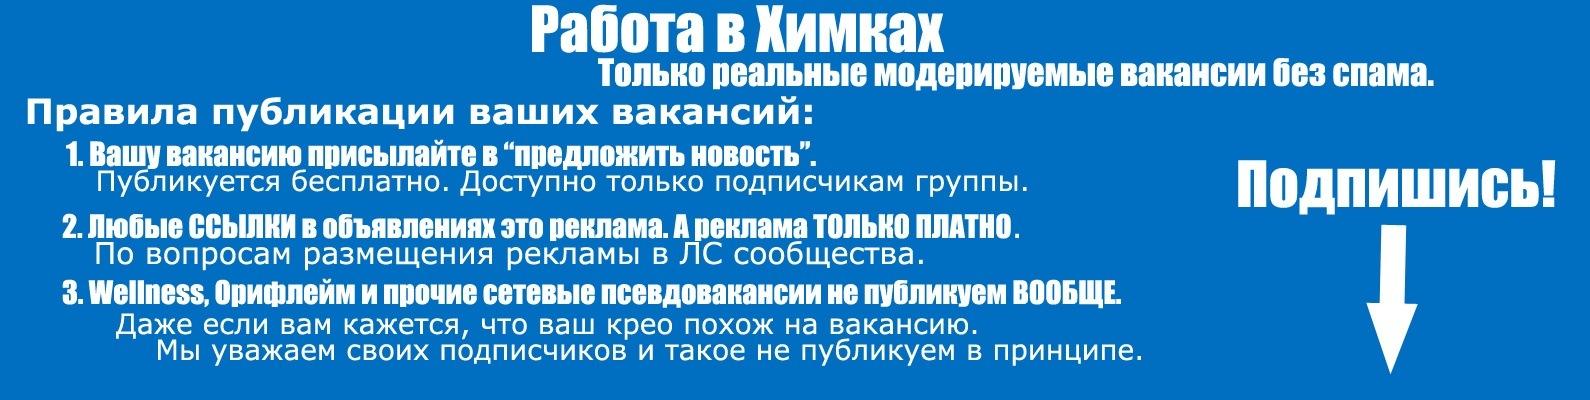 Мфц кузьминки официальный сайт загранпаспорт